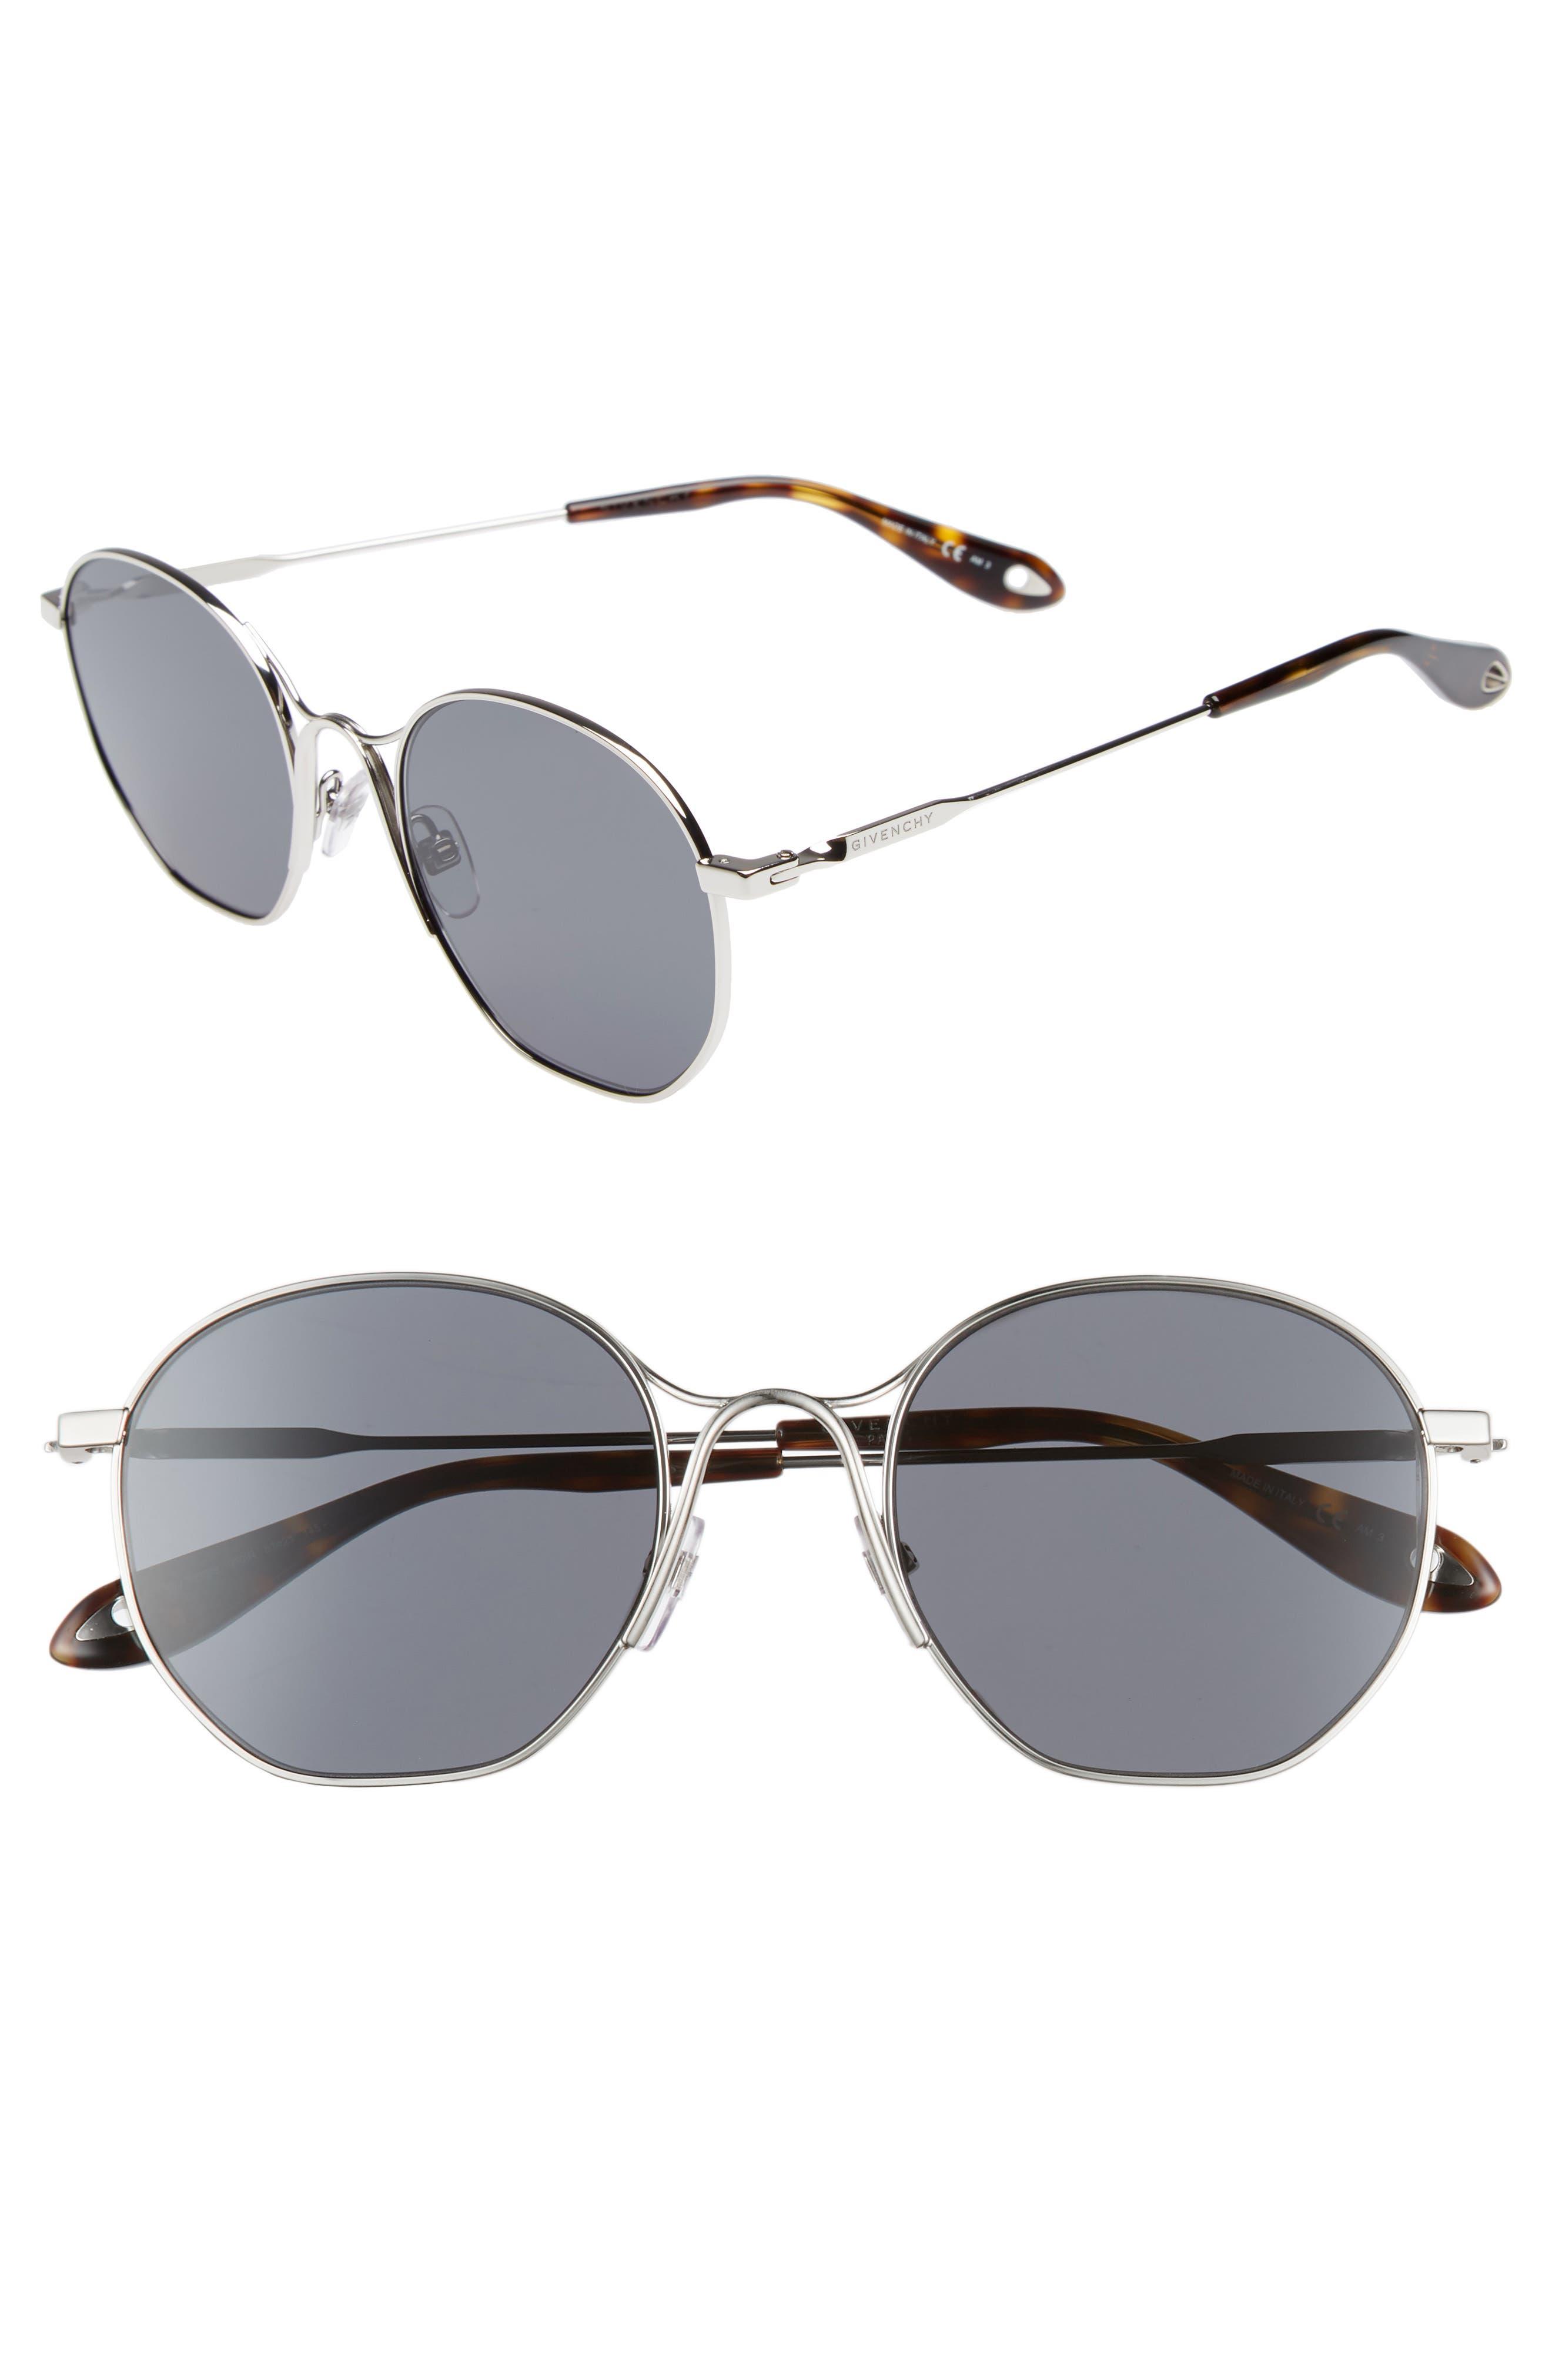 53mm Squared Round Metal Sunglasses,                             Main thumbnail 1, color,                             PALLADIUM